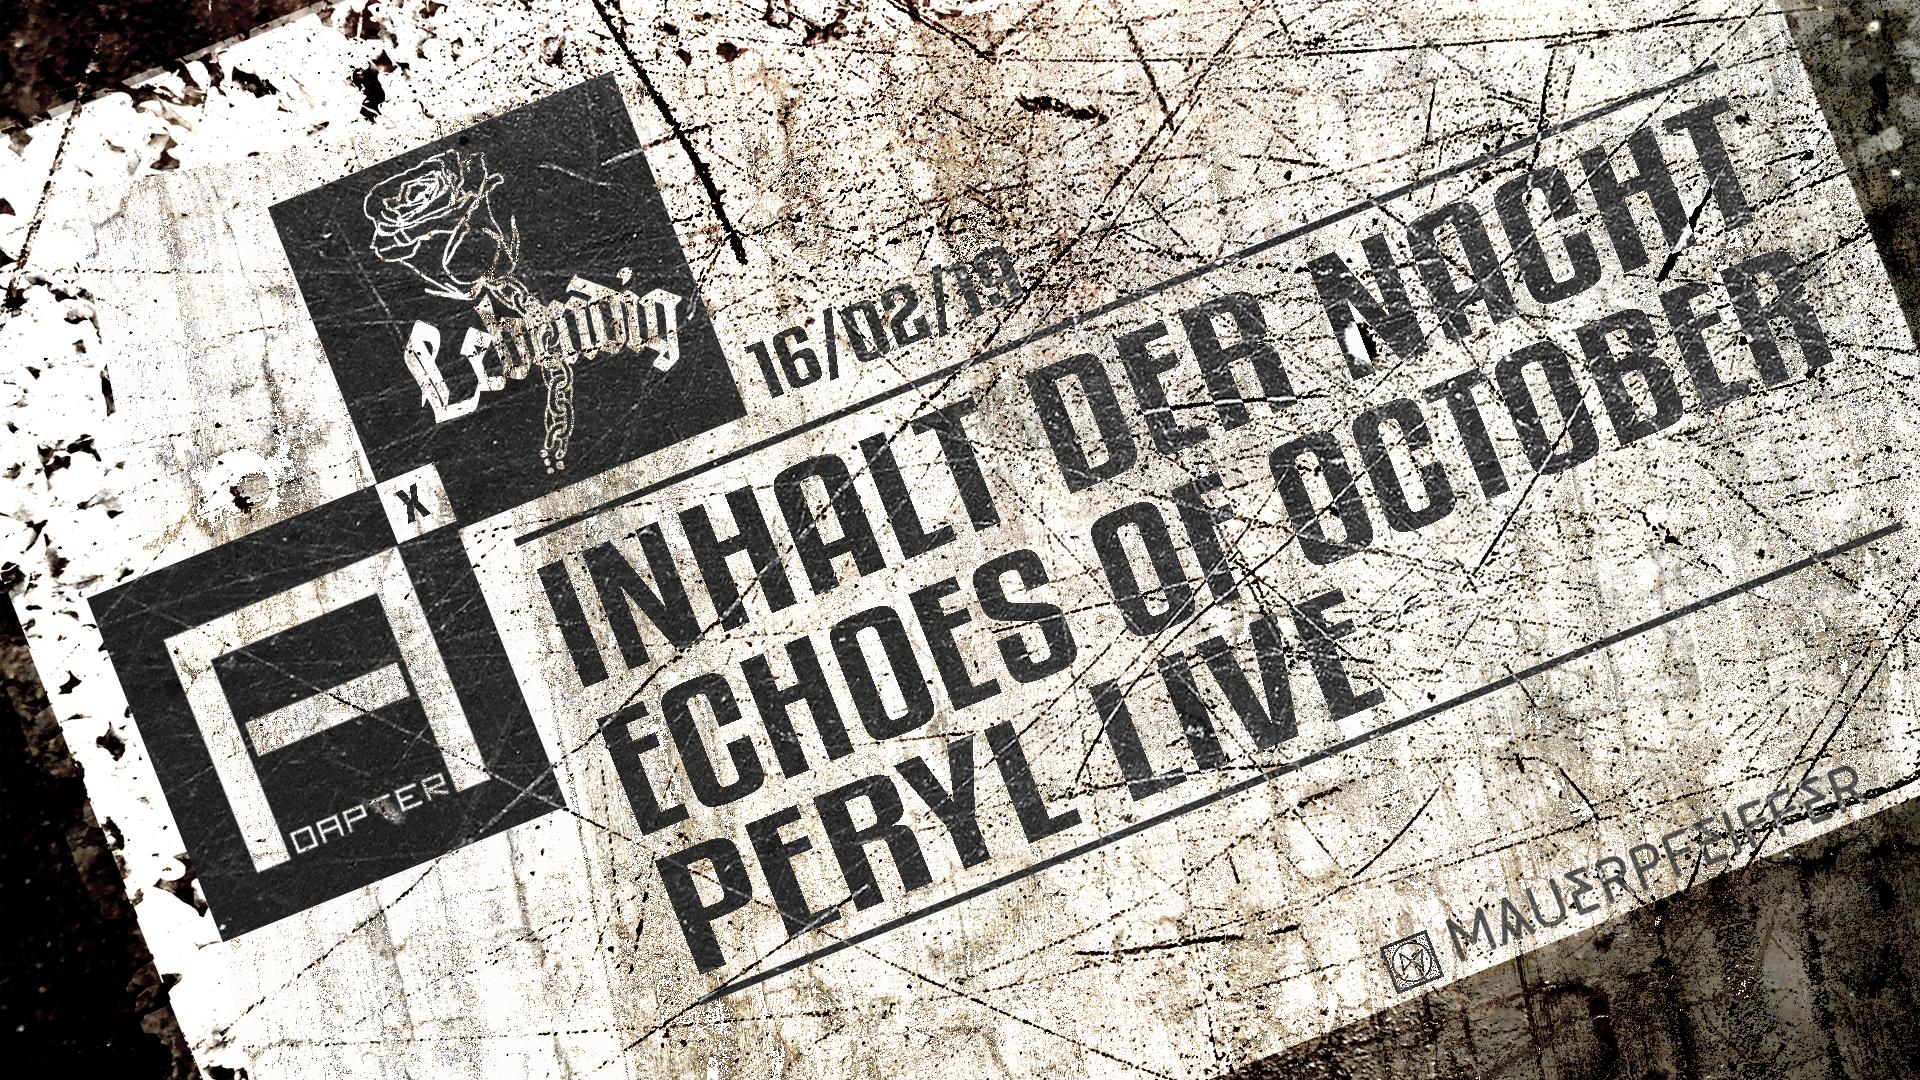 Adapter x Lebendig w/ Inhalt der Nacht Echoes of October & Peryl